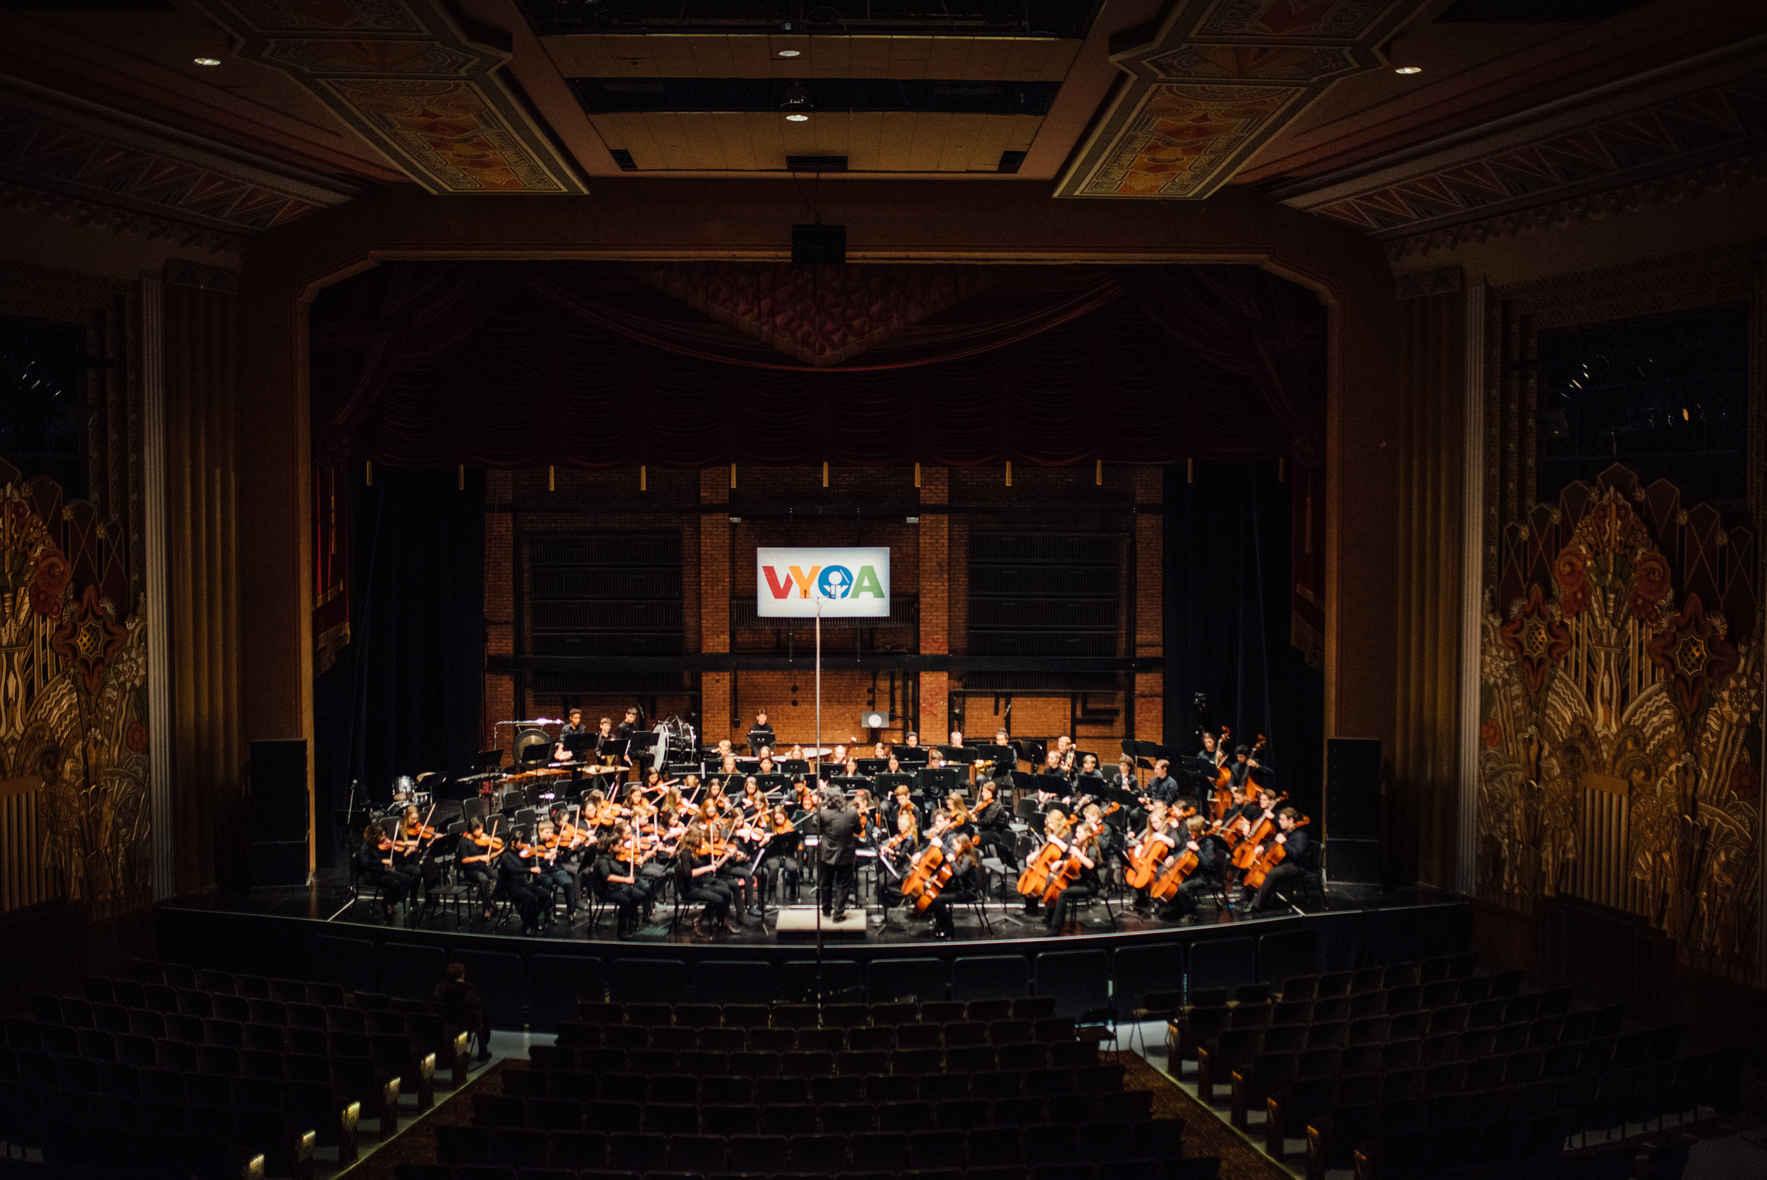 VYO Winter Concert image